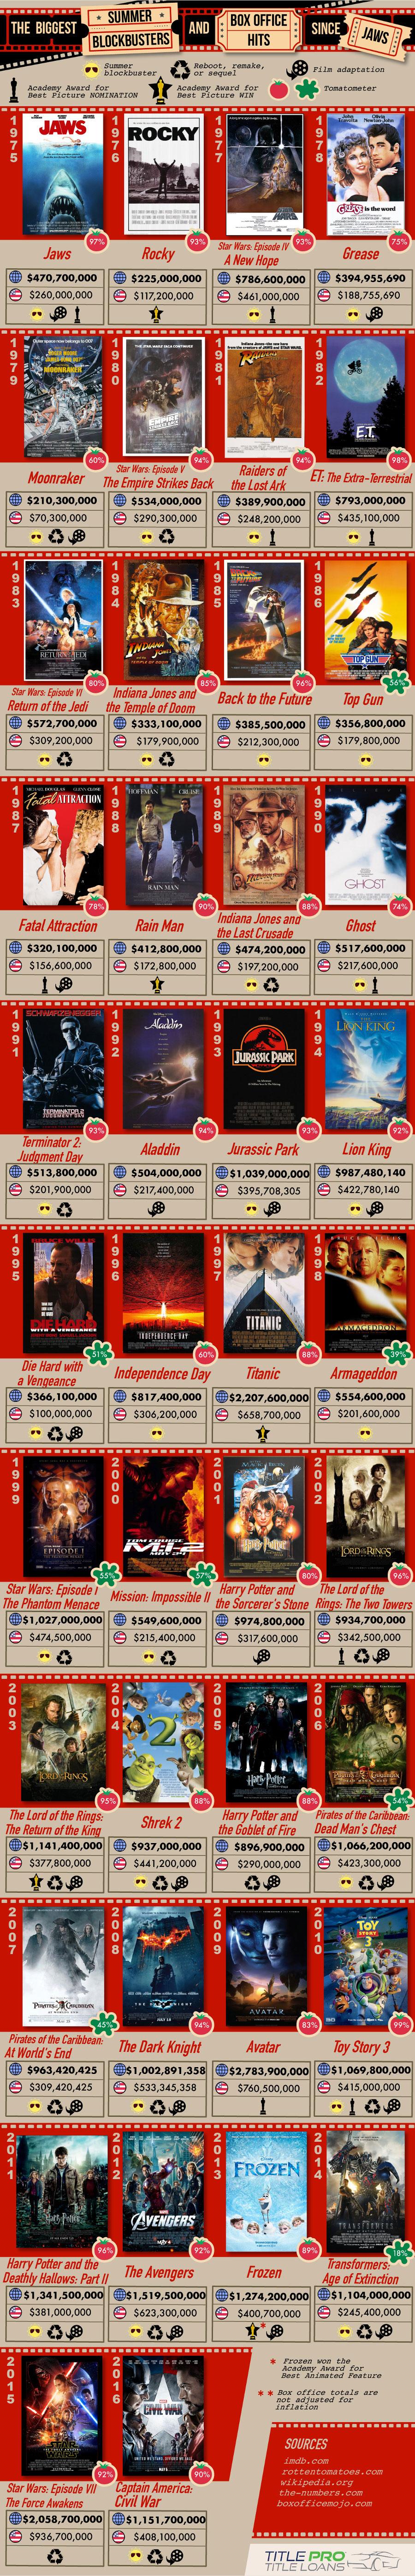 Top Summer box office hits